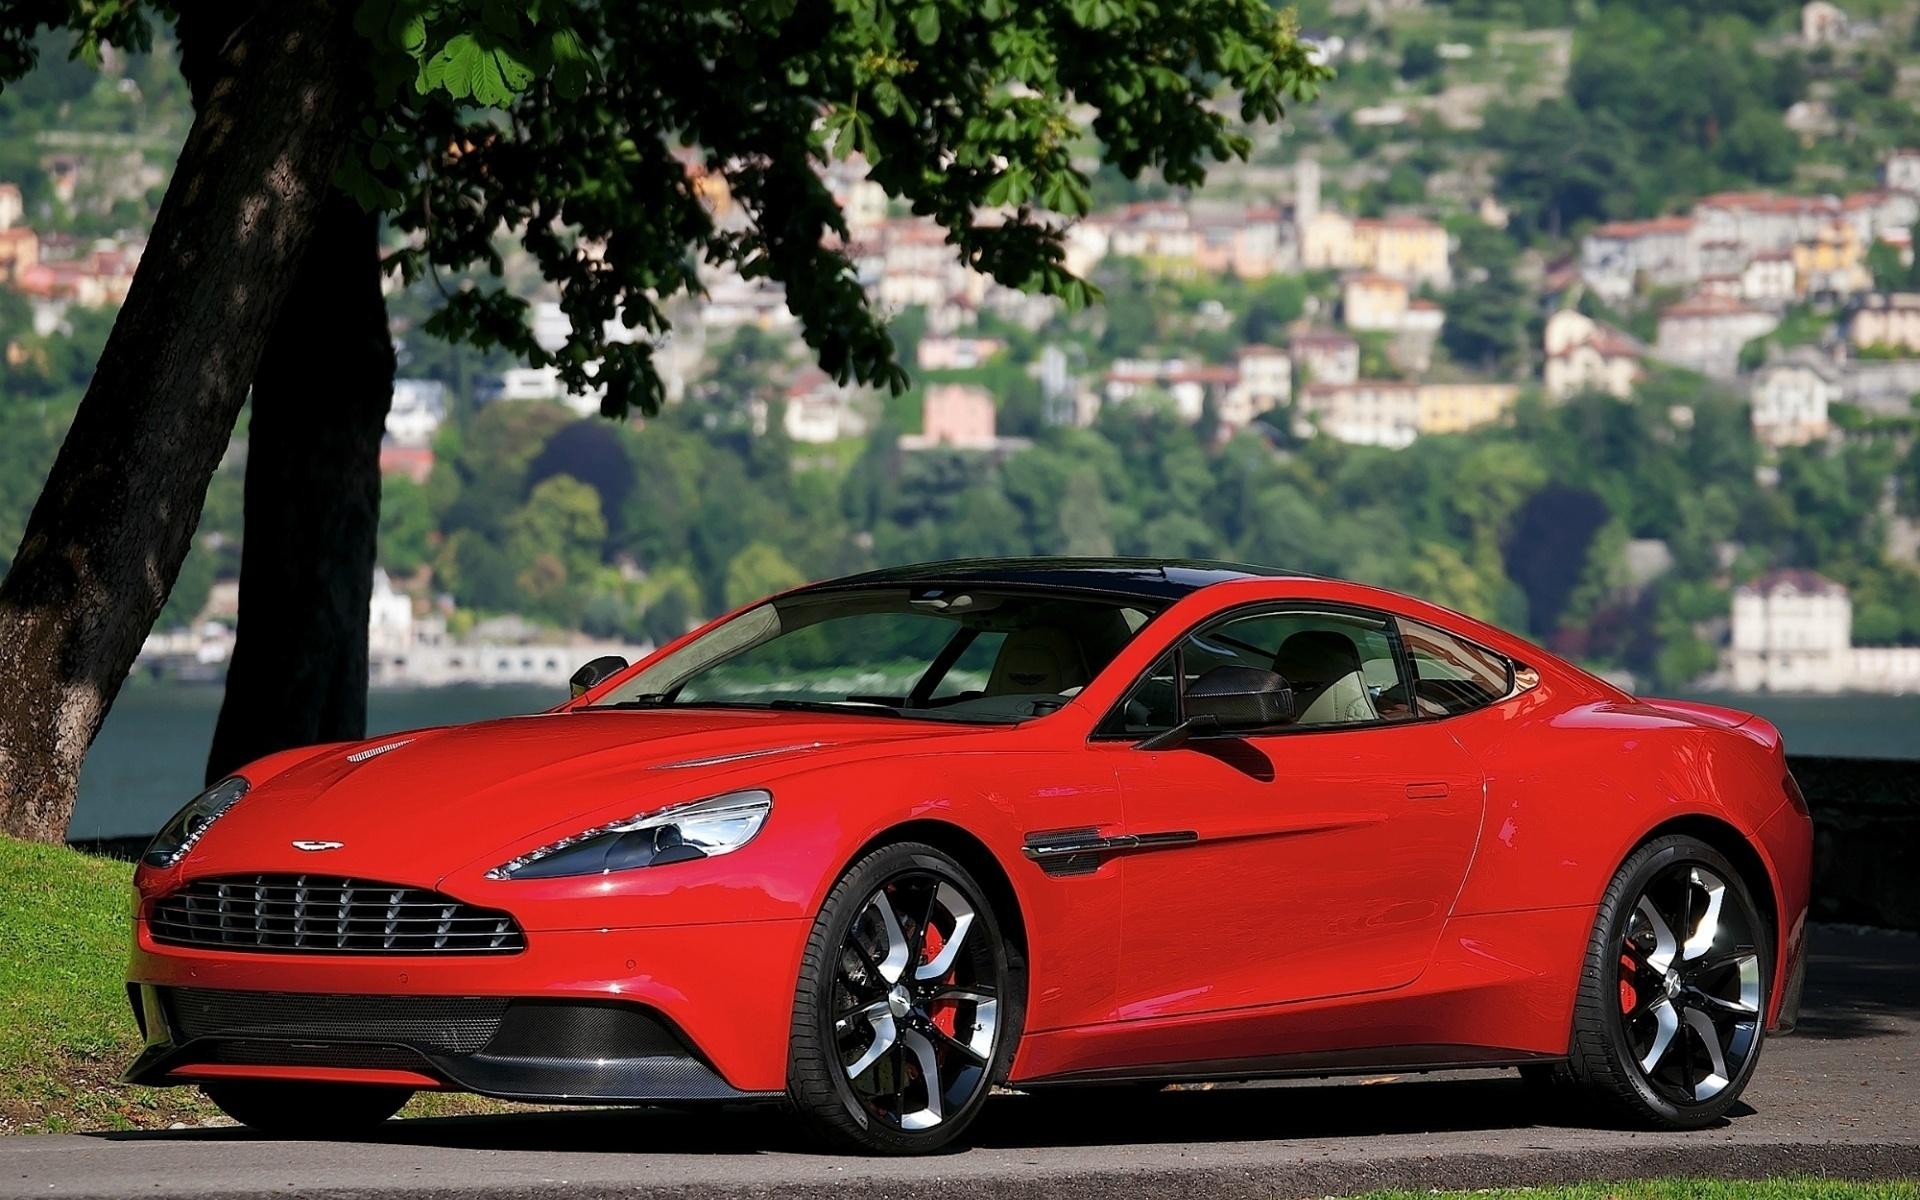 Carro Aston Martin Vermelho Poze Wallpaper Hd 1600x1000 Wallpapertip